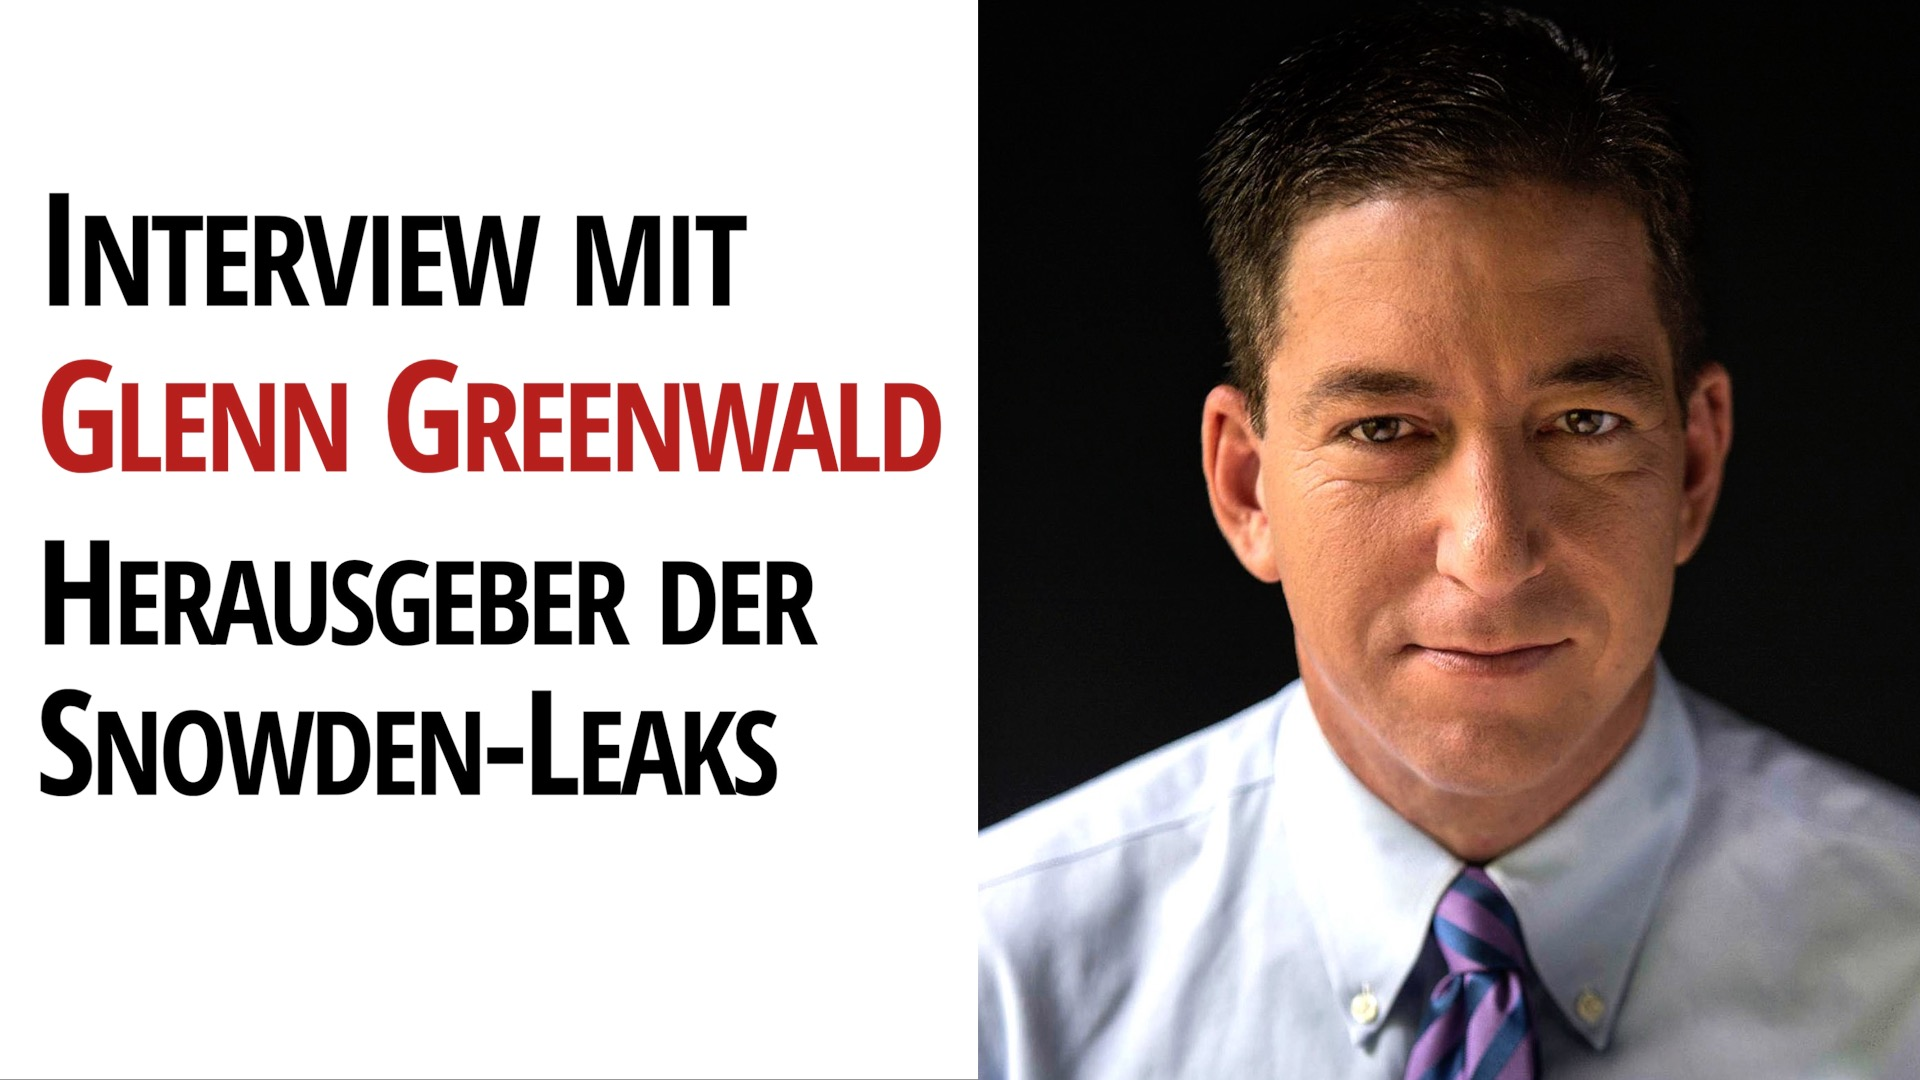 Glenn Greenwald Edward Snowden Julian Assange COVID 19 Bernie Sanders